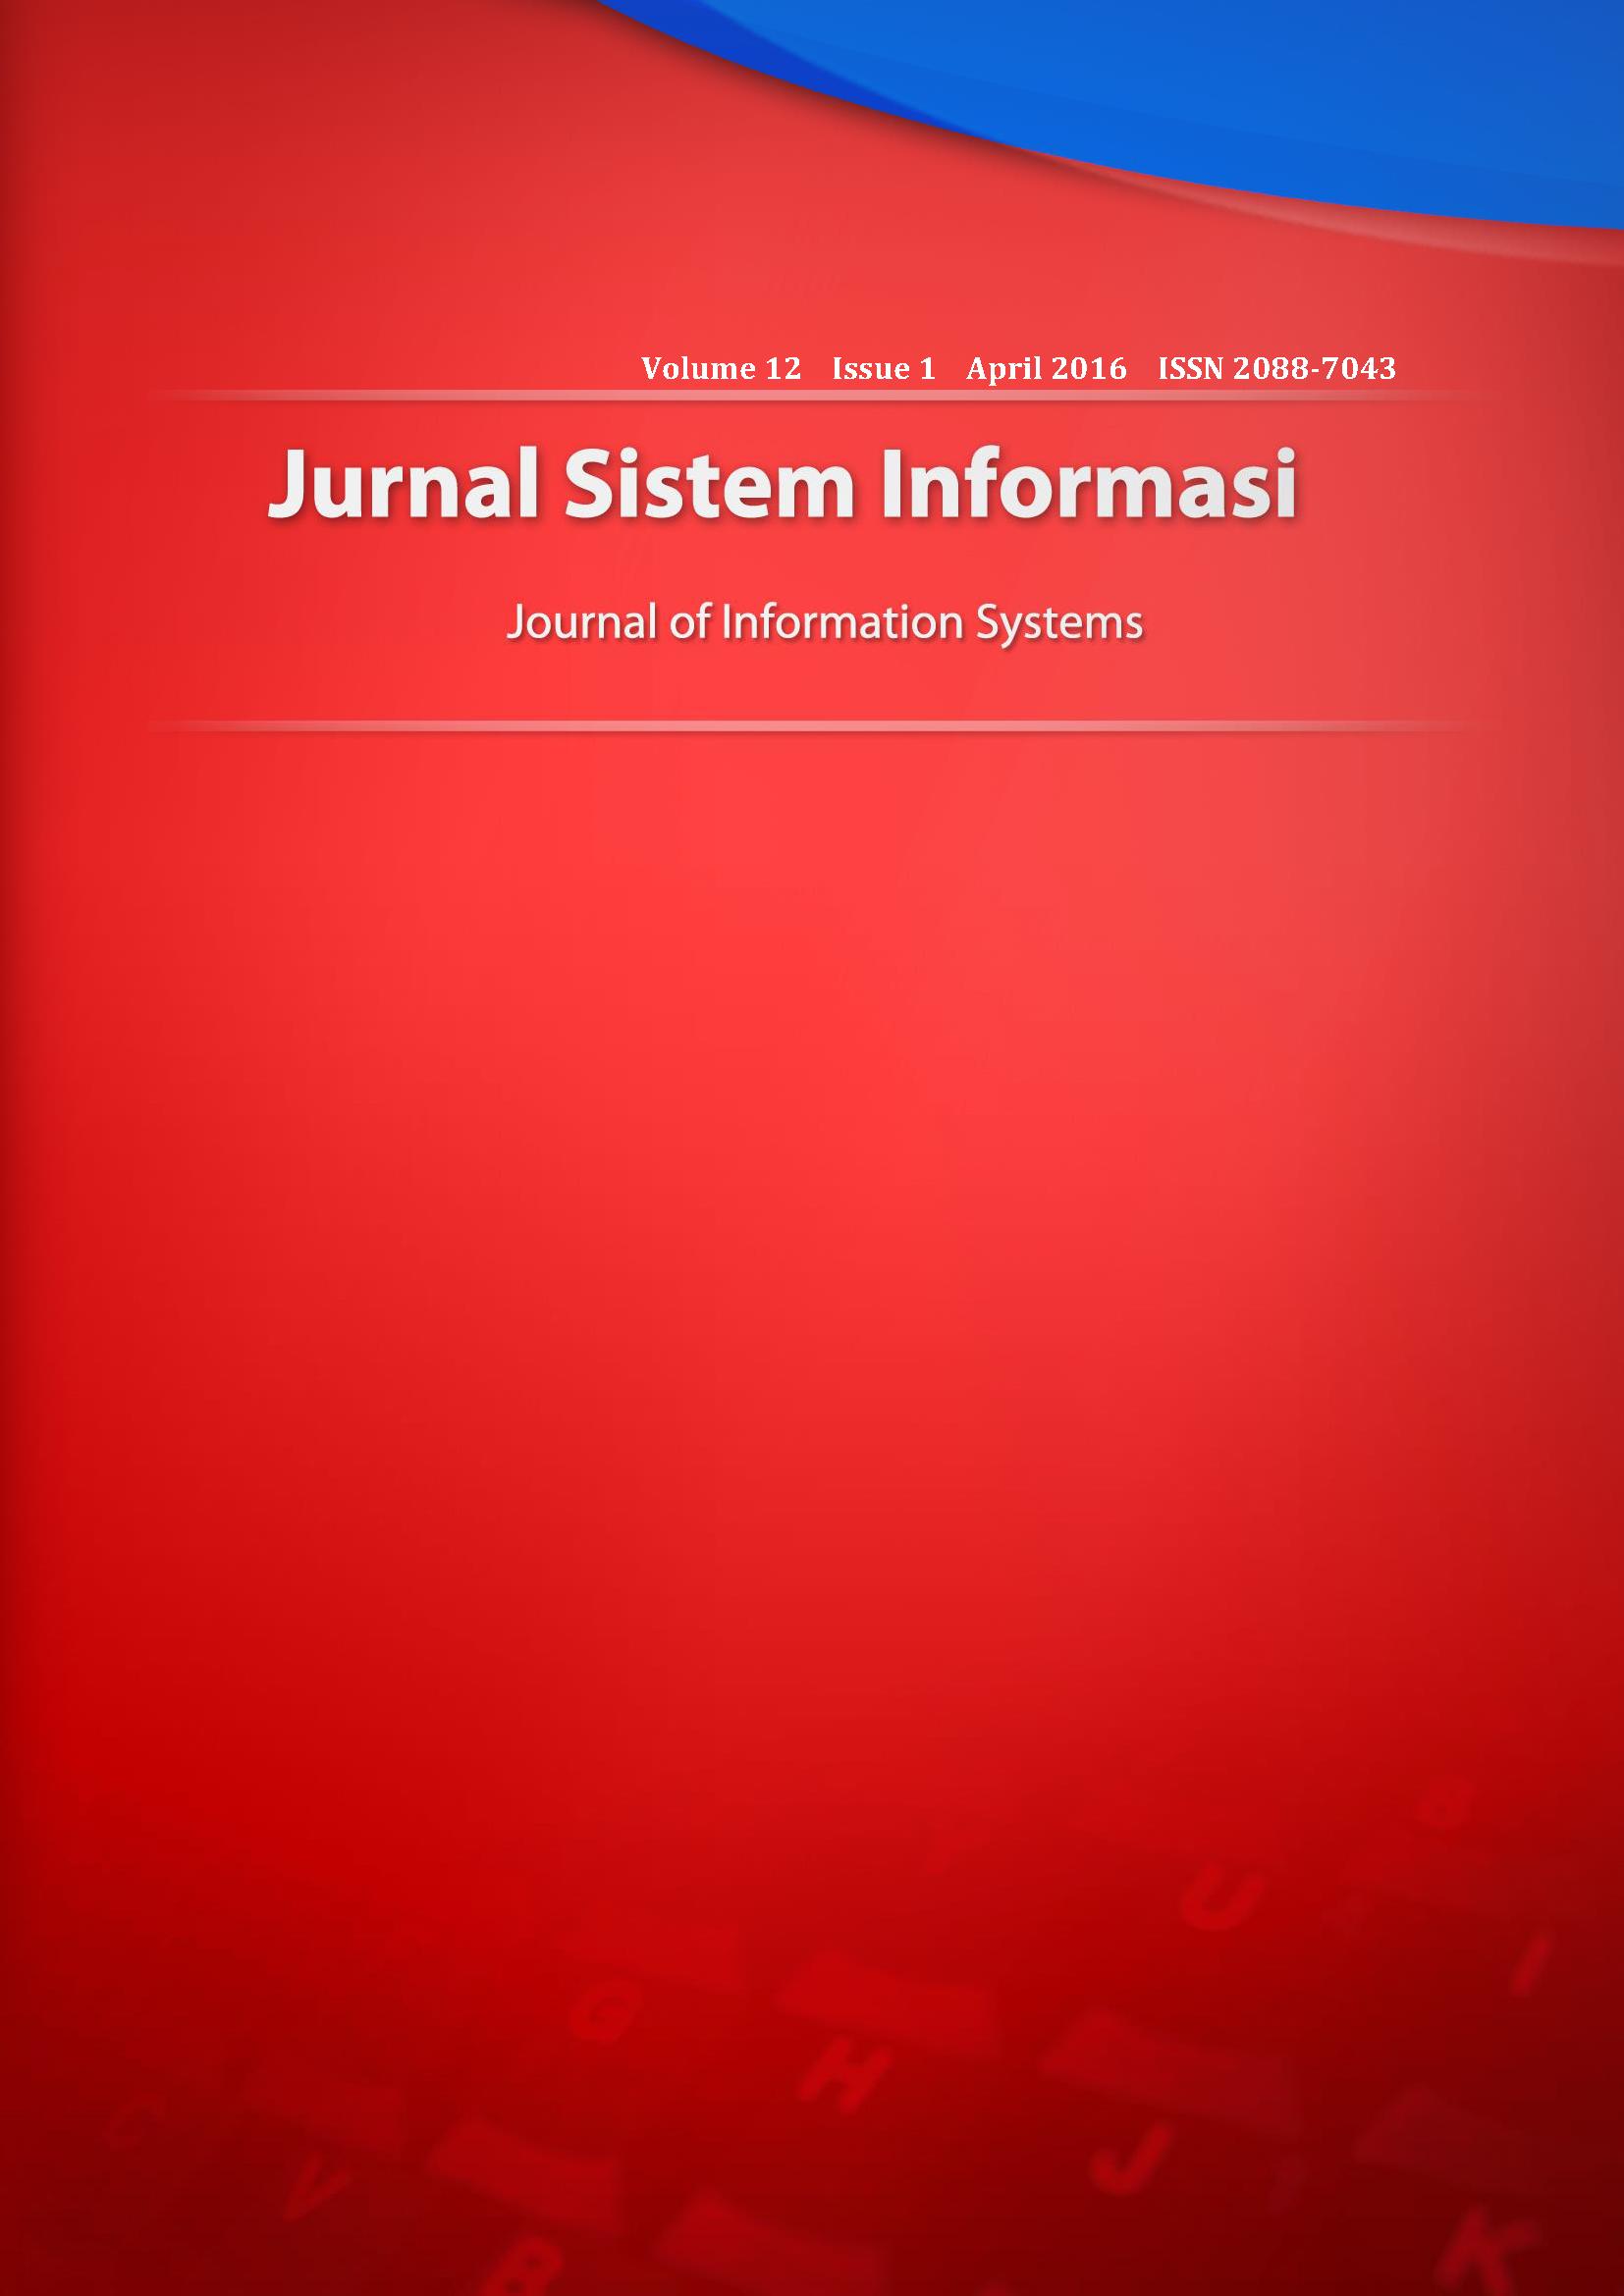 JSIVol12Iss1Year2016